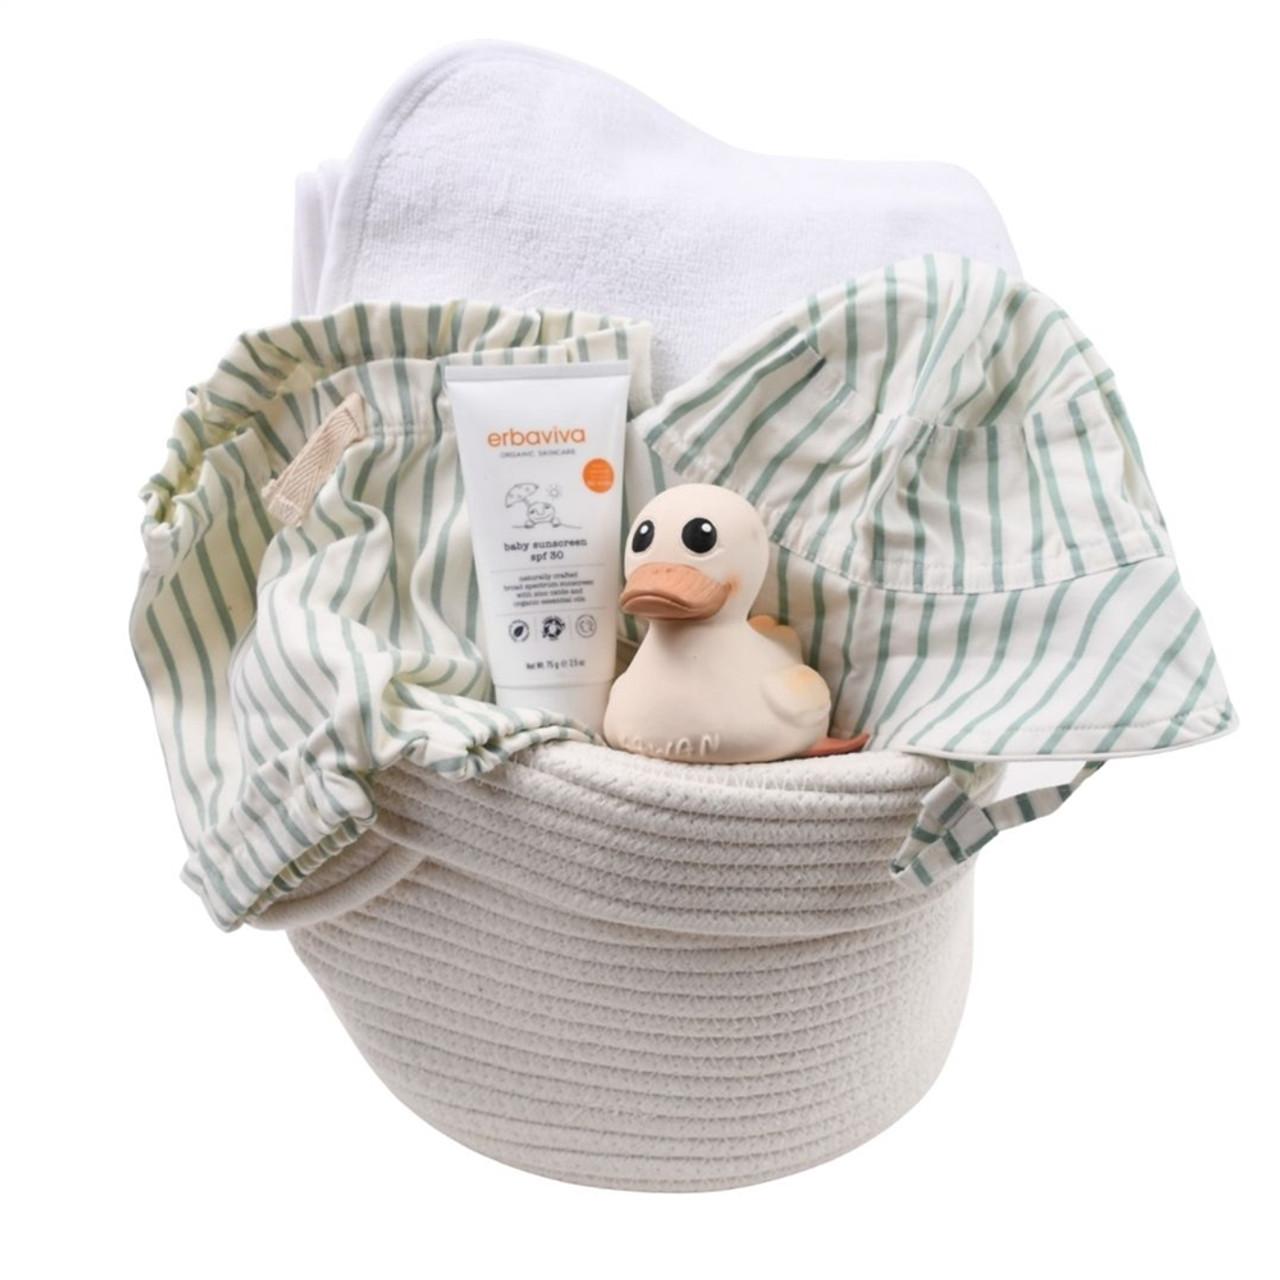 Beach Baby Gift Basket - Make Waves